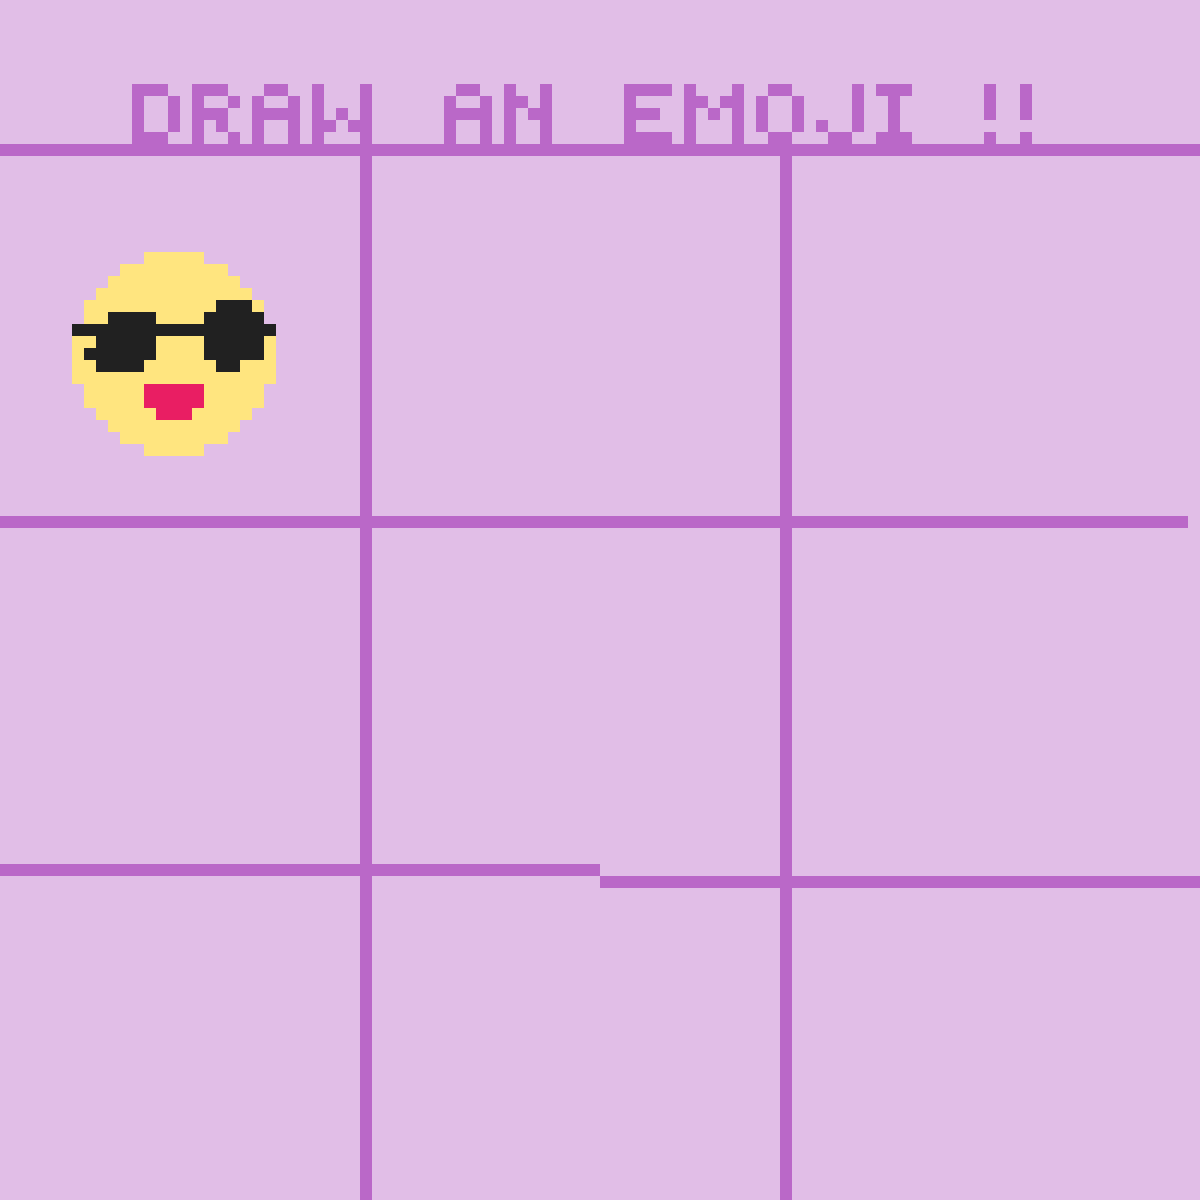 Draw an emoji by JulezRulz